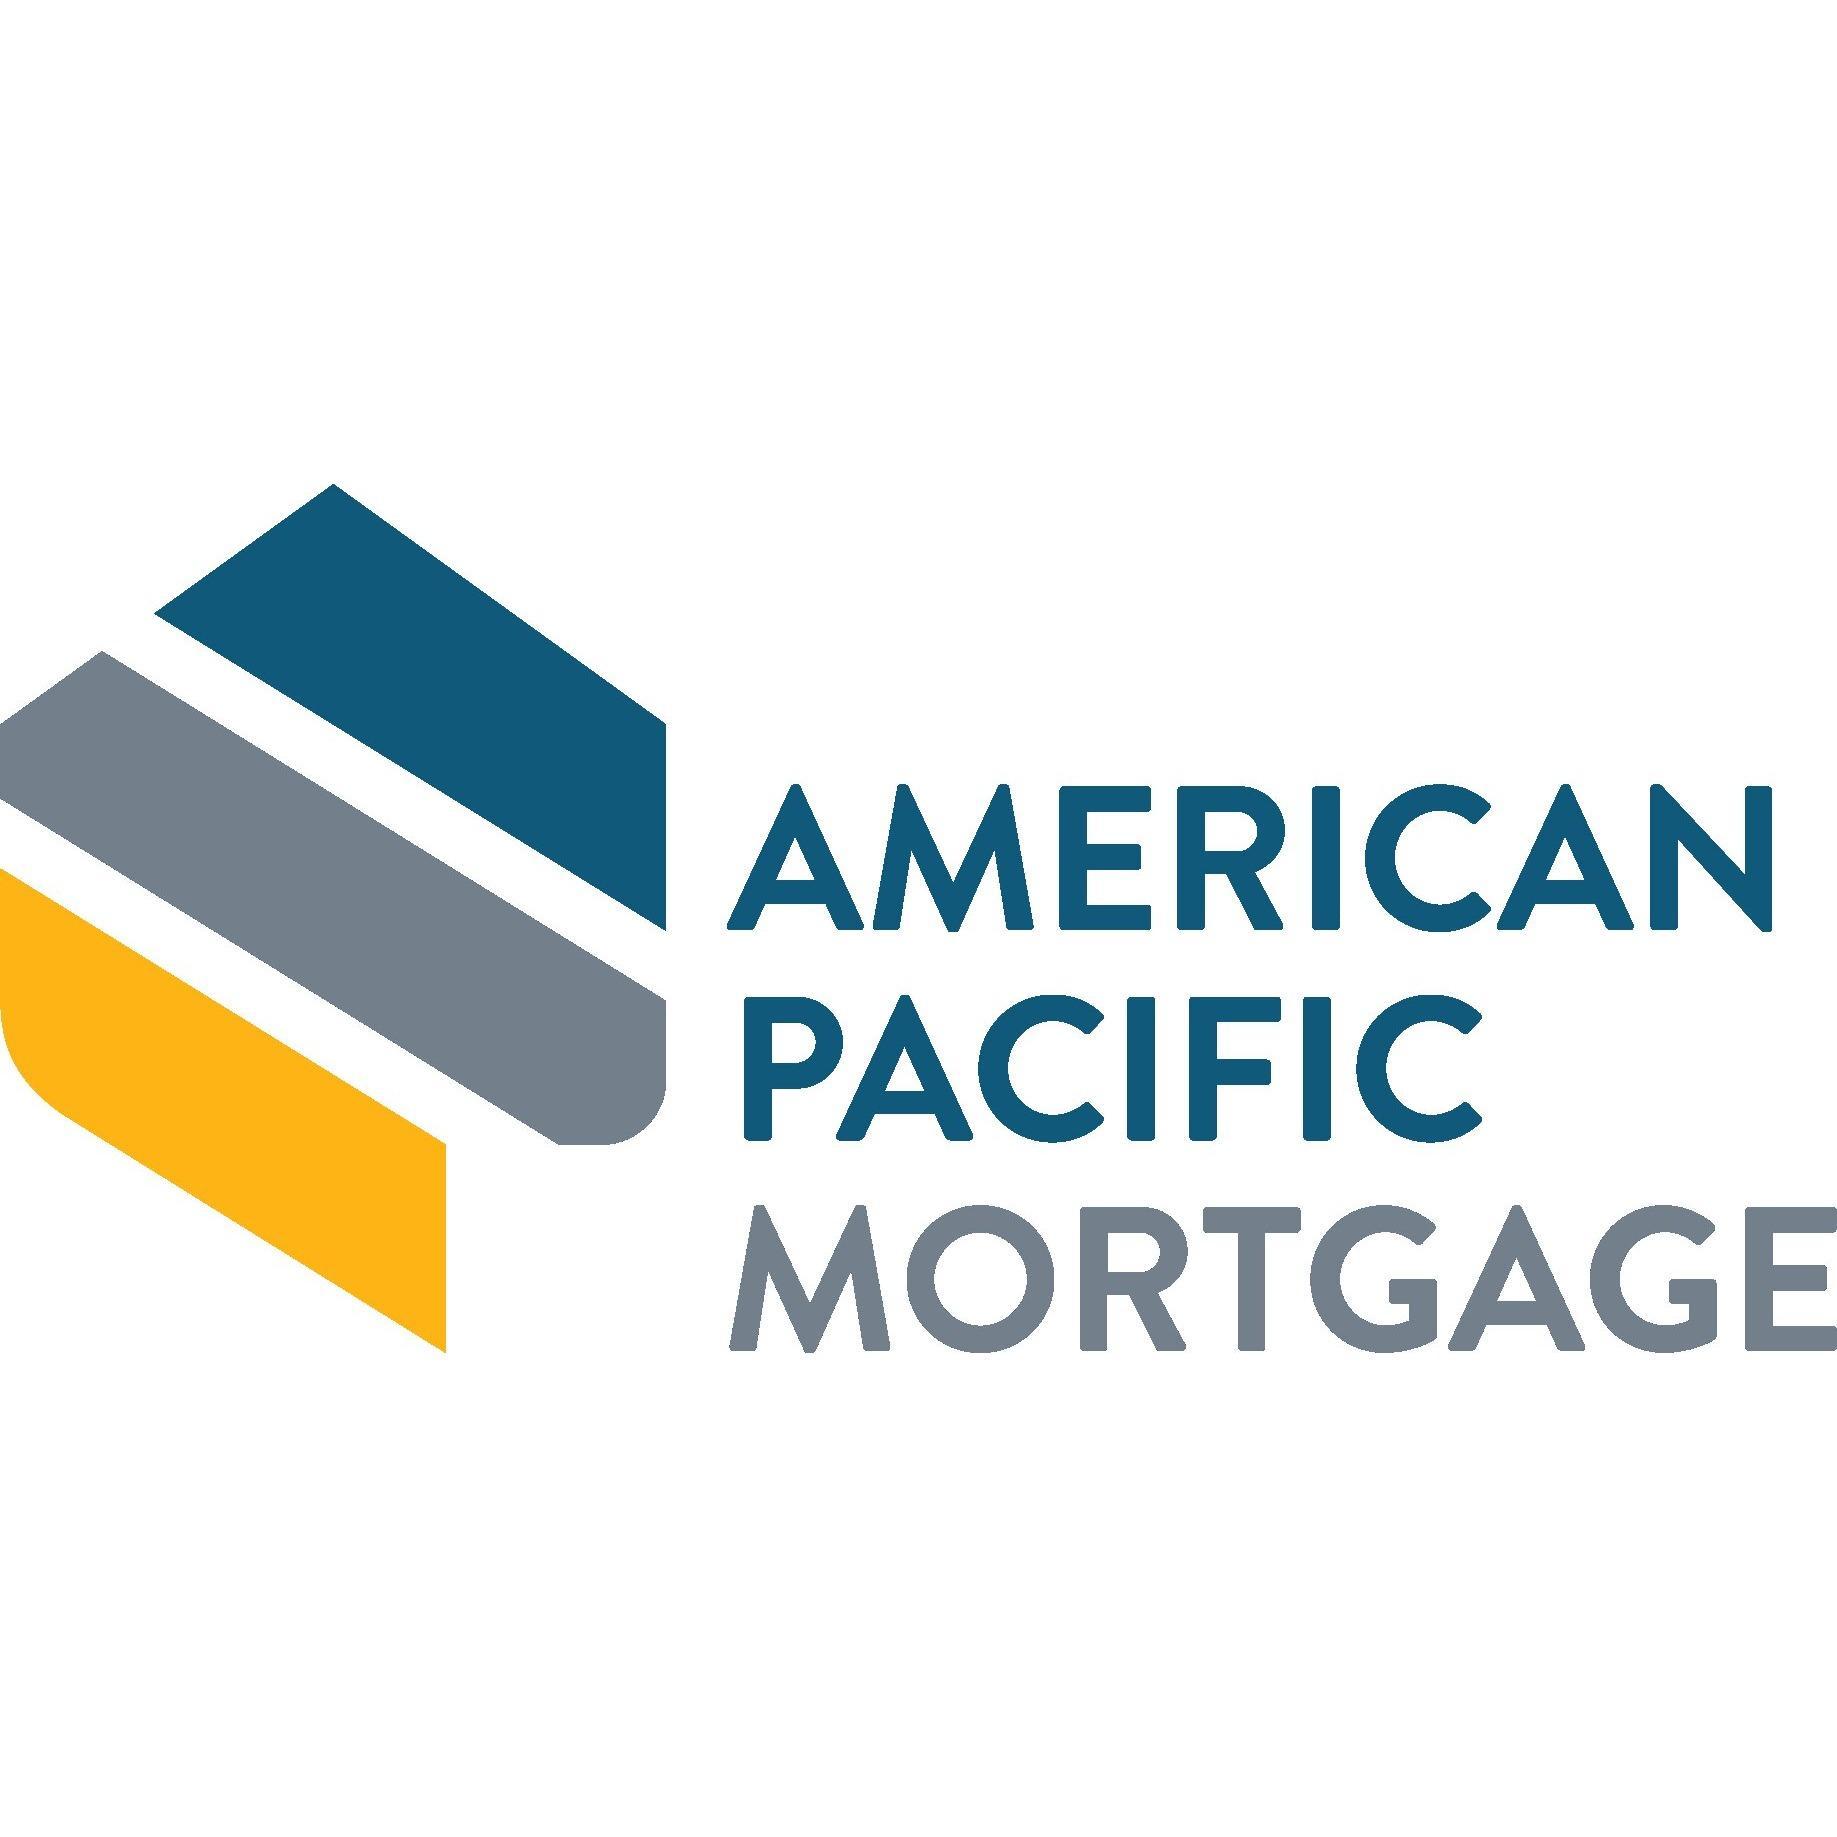 Julie Sams | American Pacific Mortgage - Gig Harbor, WA 98332 - (253)606-9582 | ShowMeLocal.com